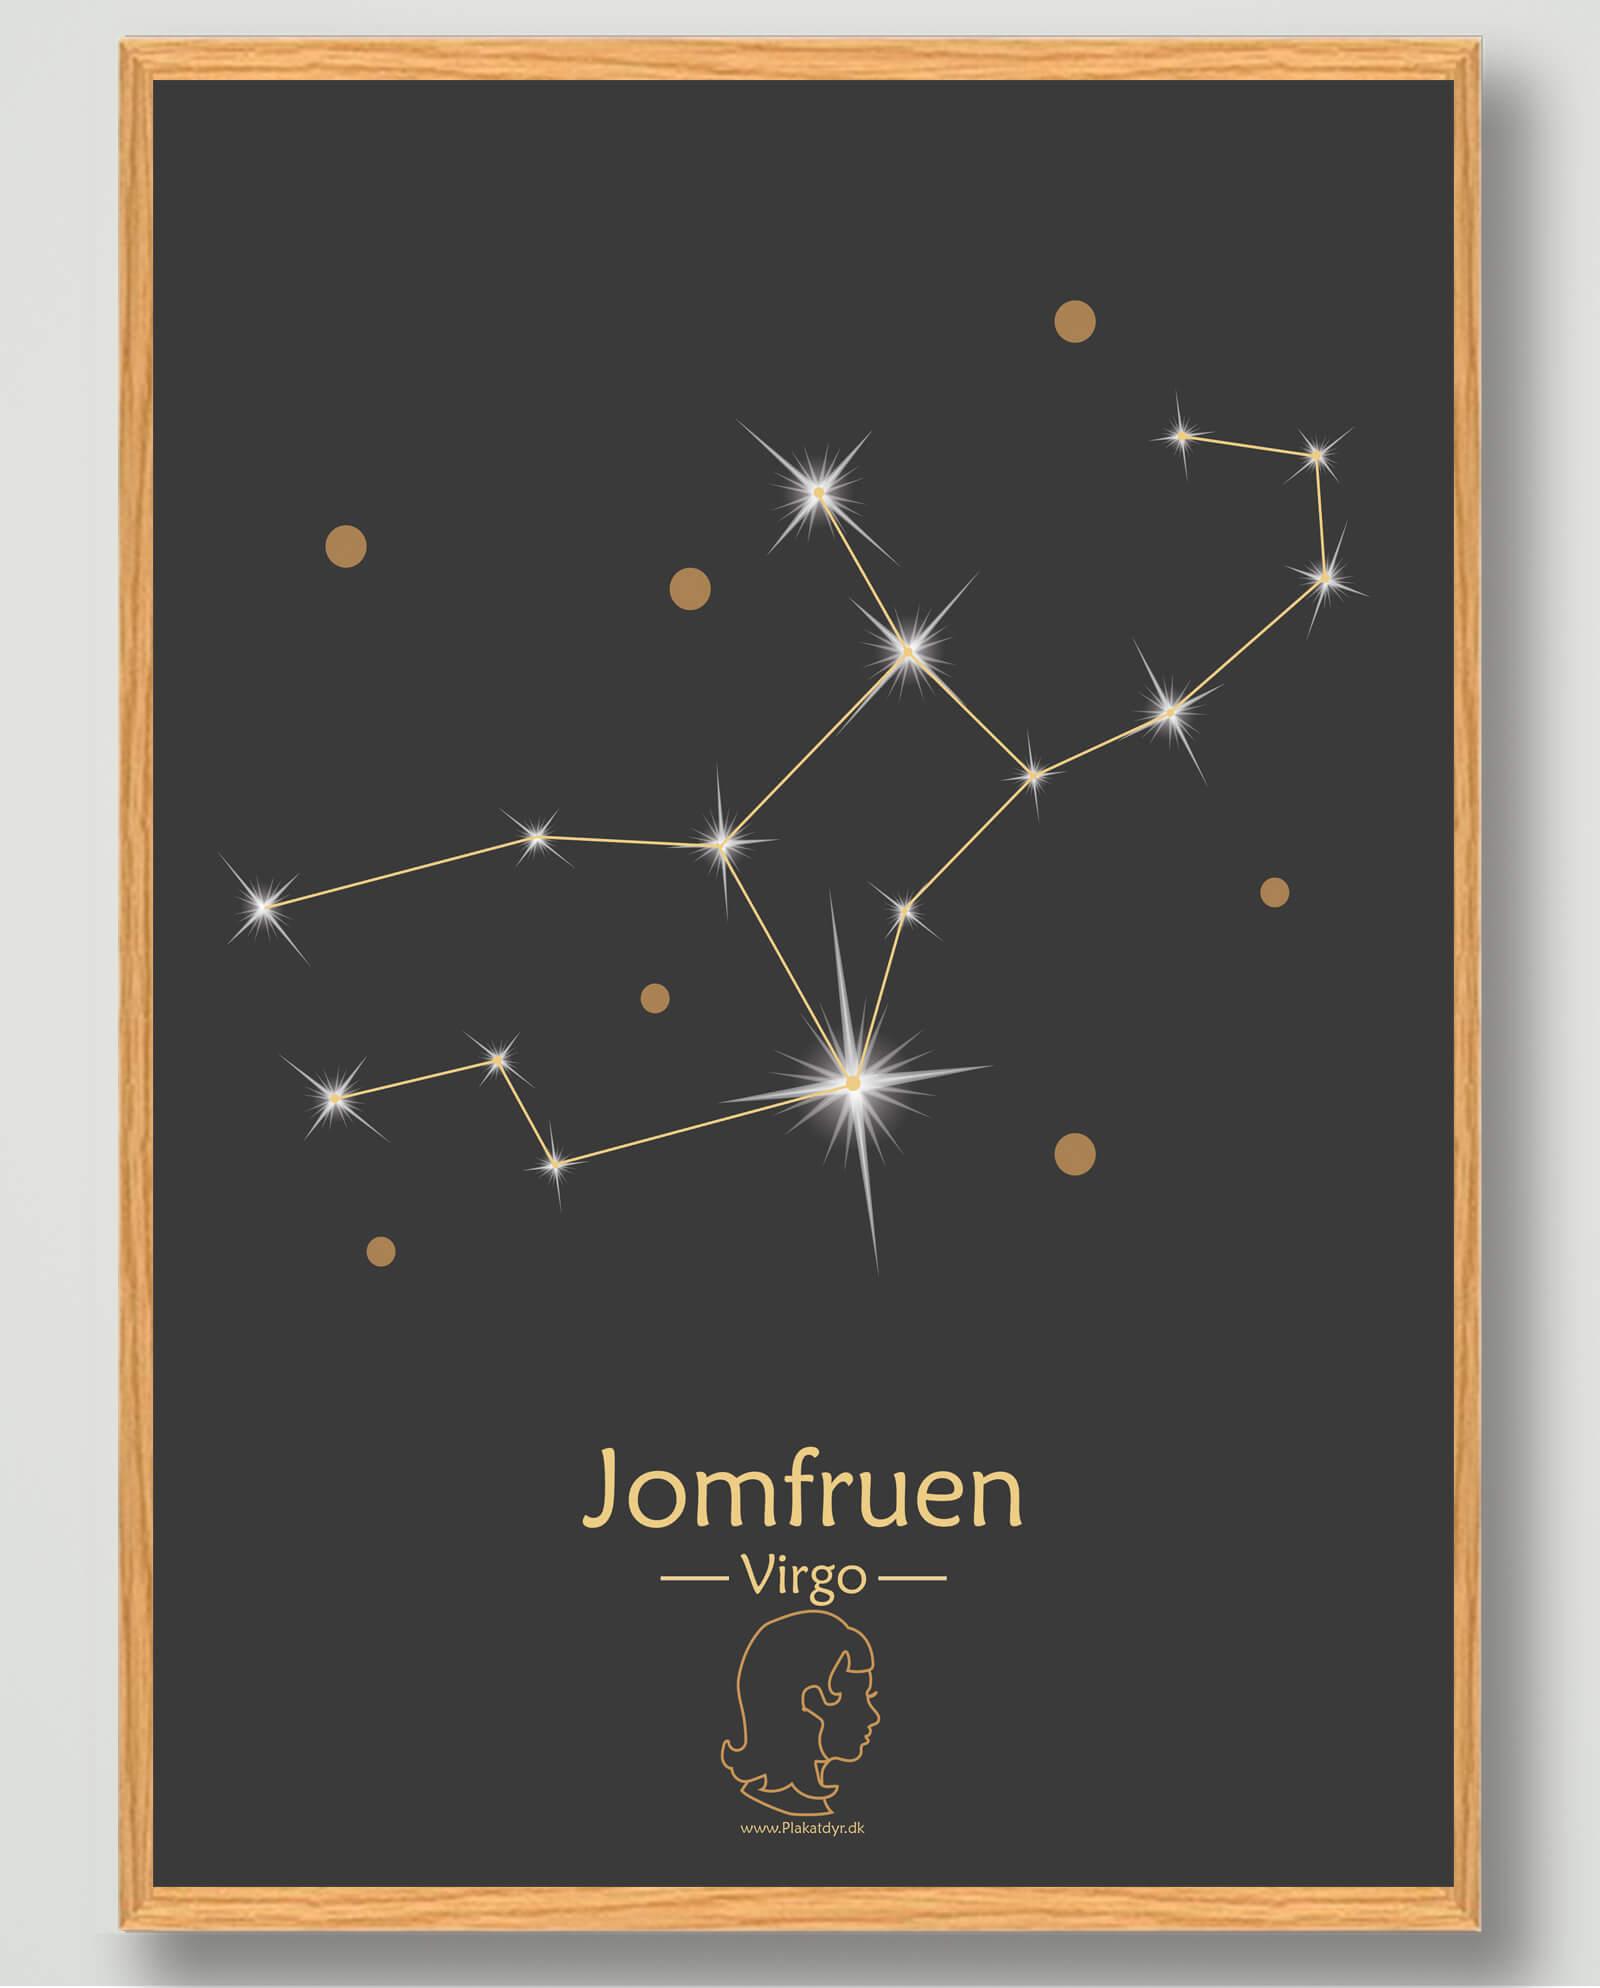 Stjernebillede jomfruen (sort) - plakat